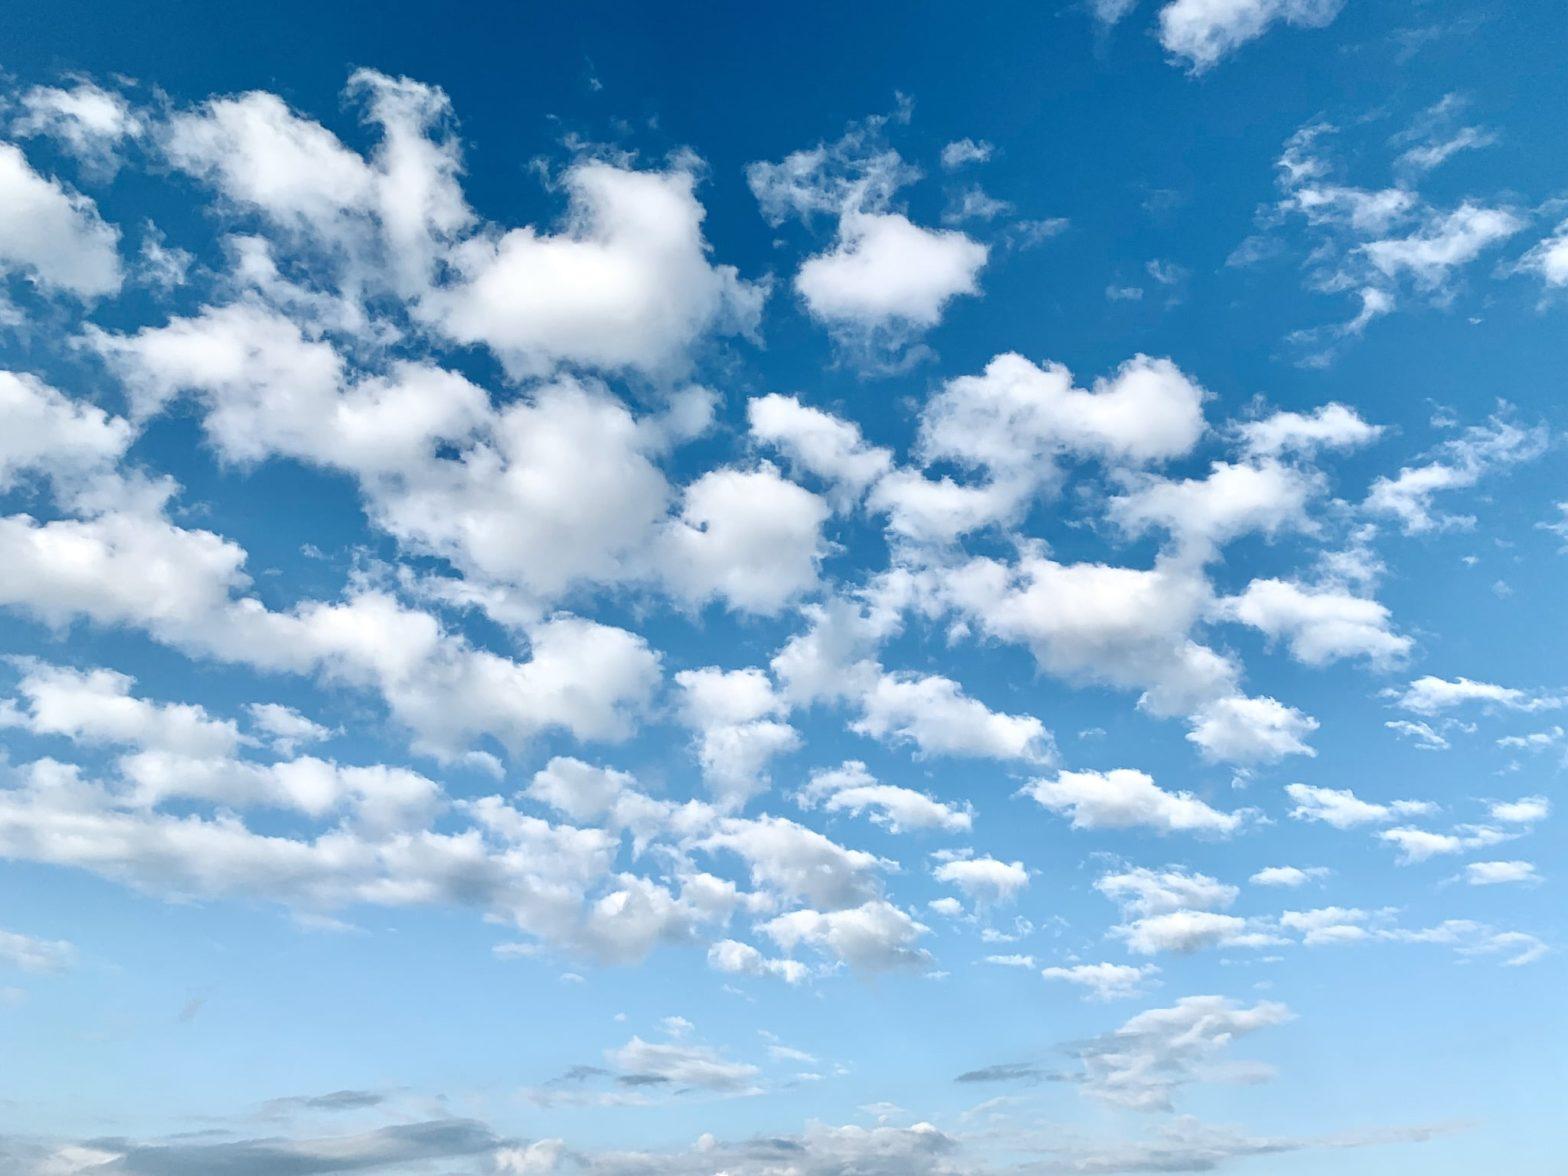 Altocumulus floccus cloud formation